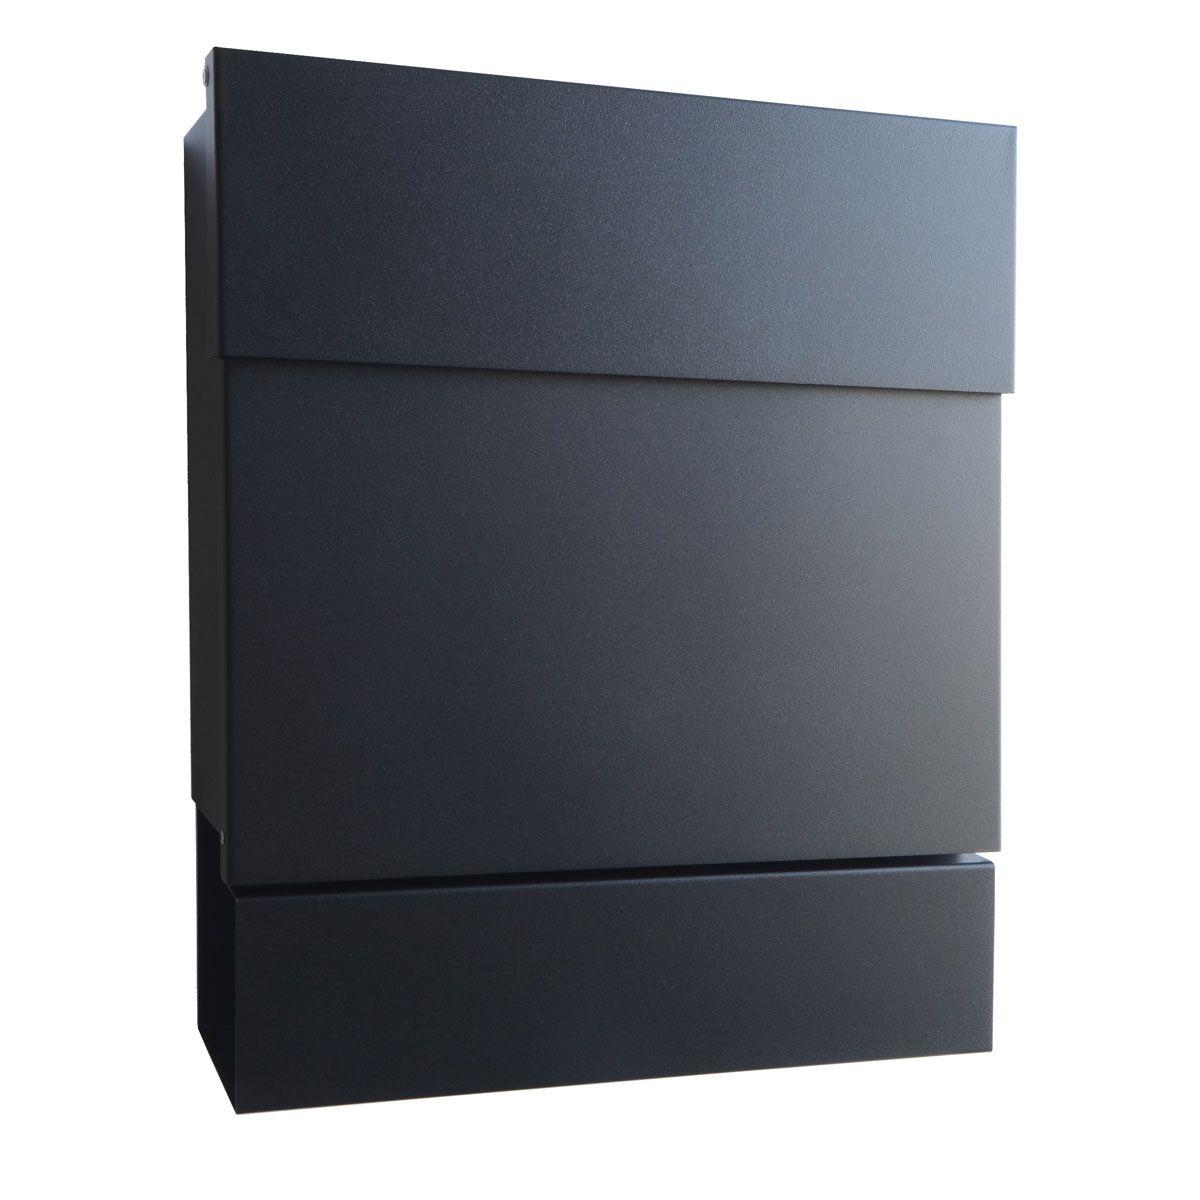 Letterman V Briefkasten radius briefkasten letterman v schwarz homesweethome